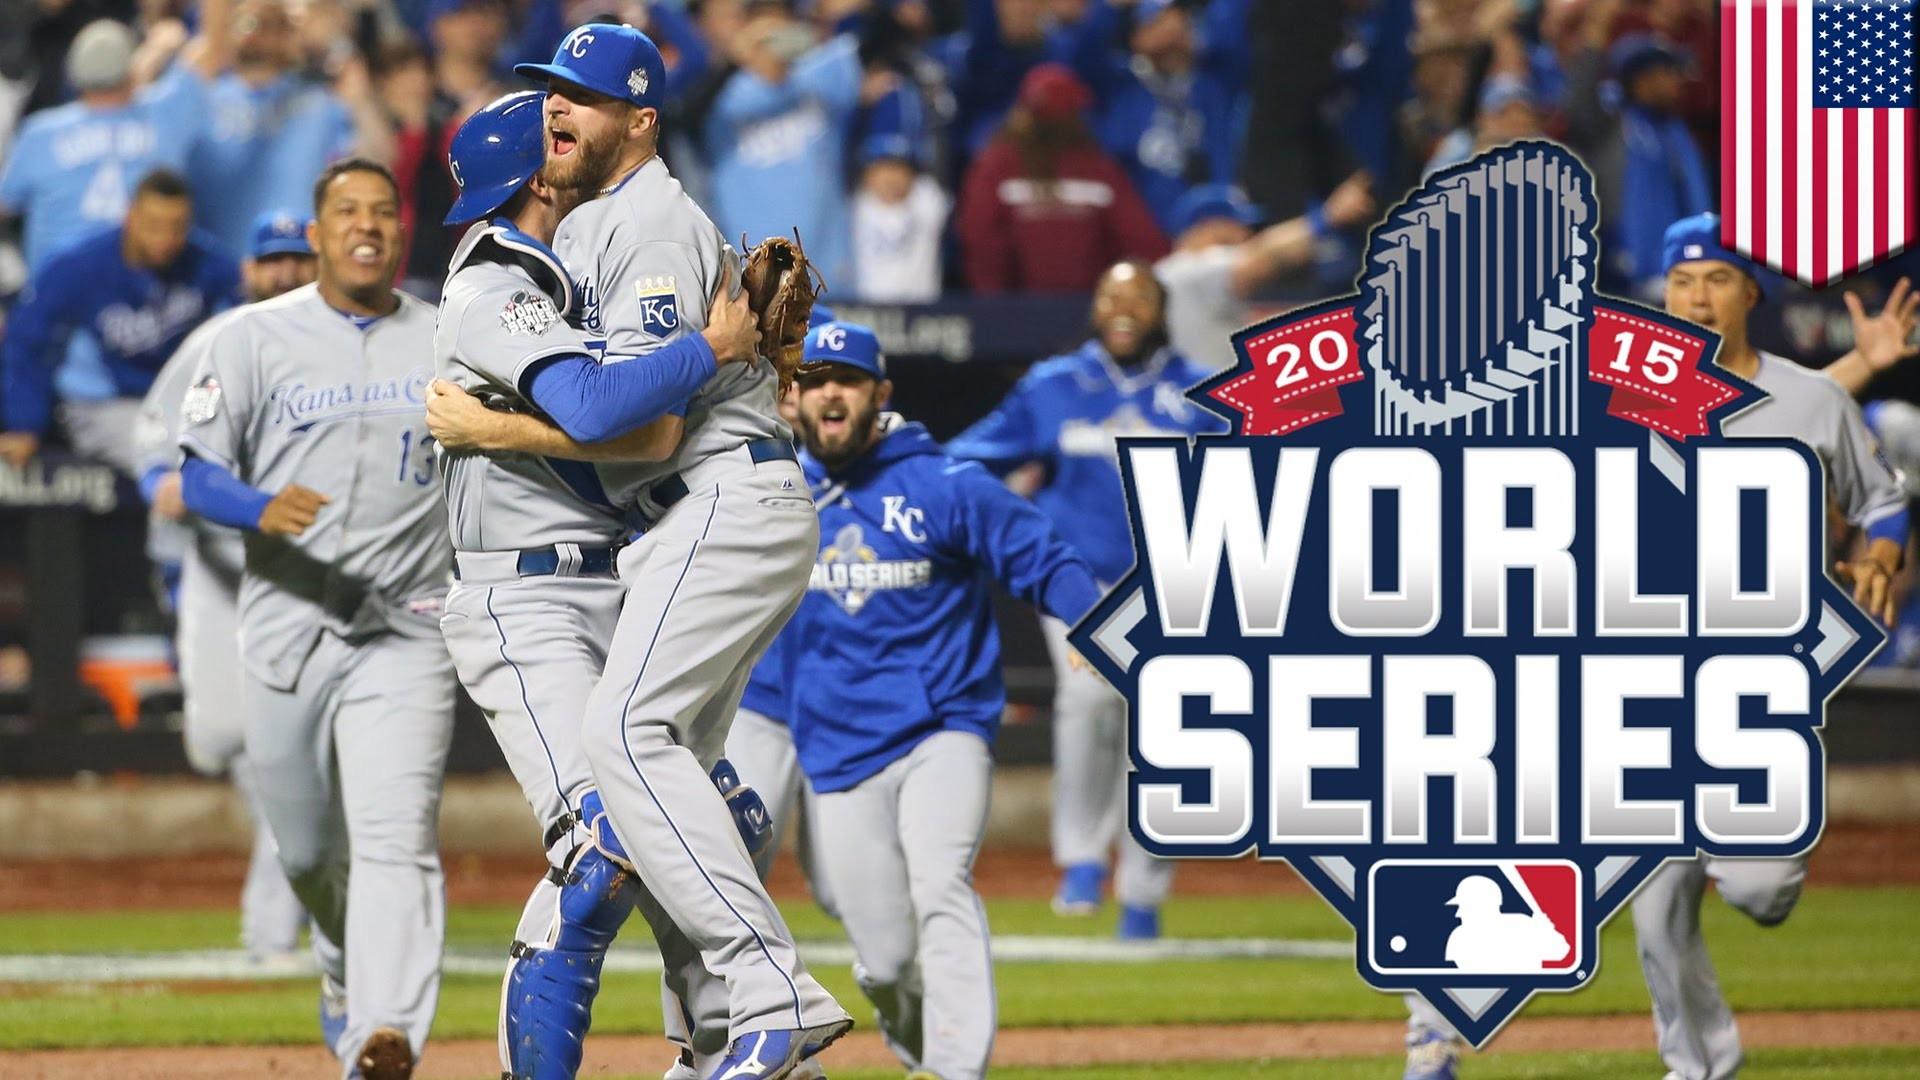 Kansas City Royals win World Series 2015: Royals crush New York Mets 7-2 in  Game 5 – YouTube